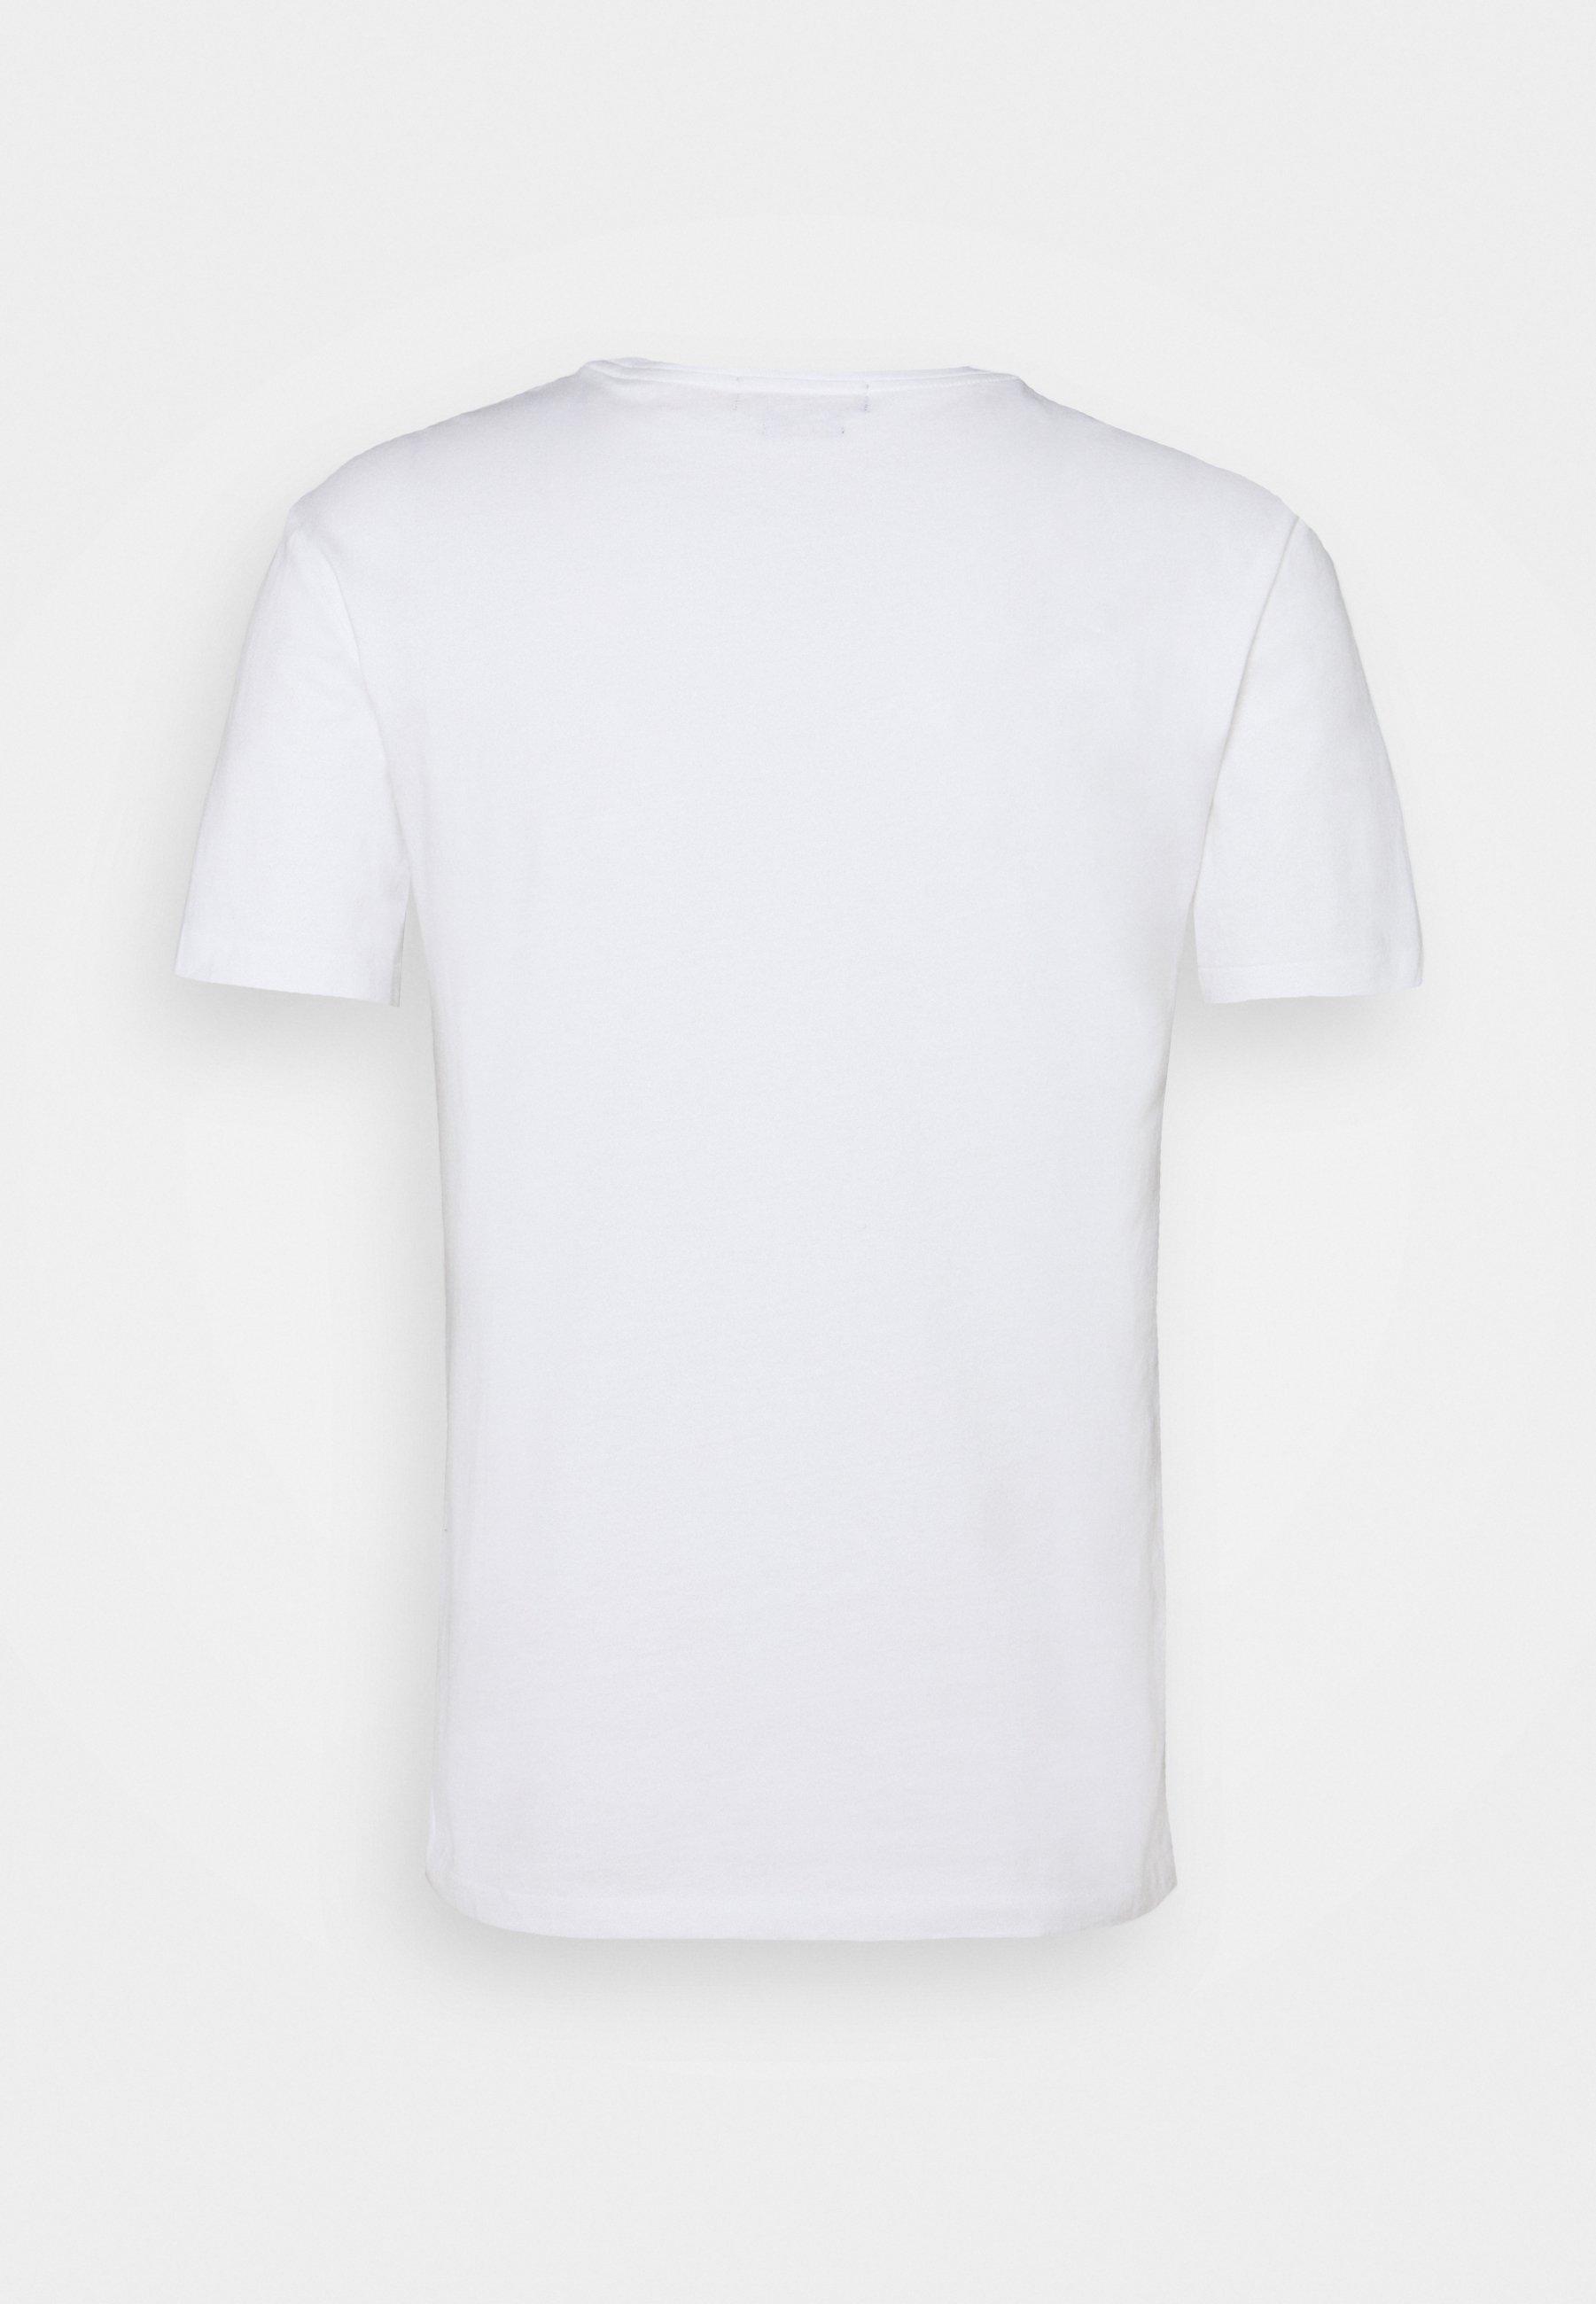 Homme CUSTOM SLIM FIT LOGO JERSEY T-SHIRT - T-shirt imprimé